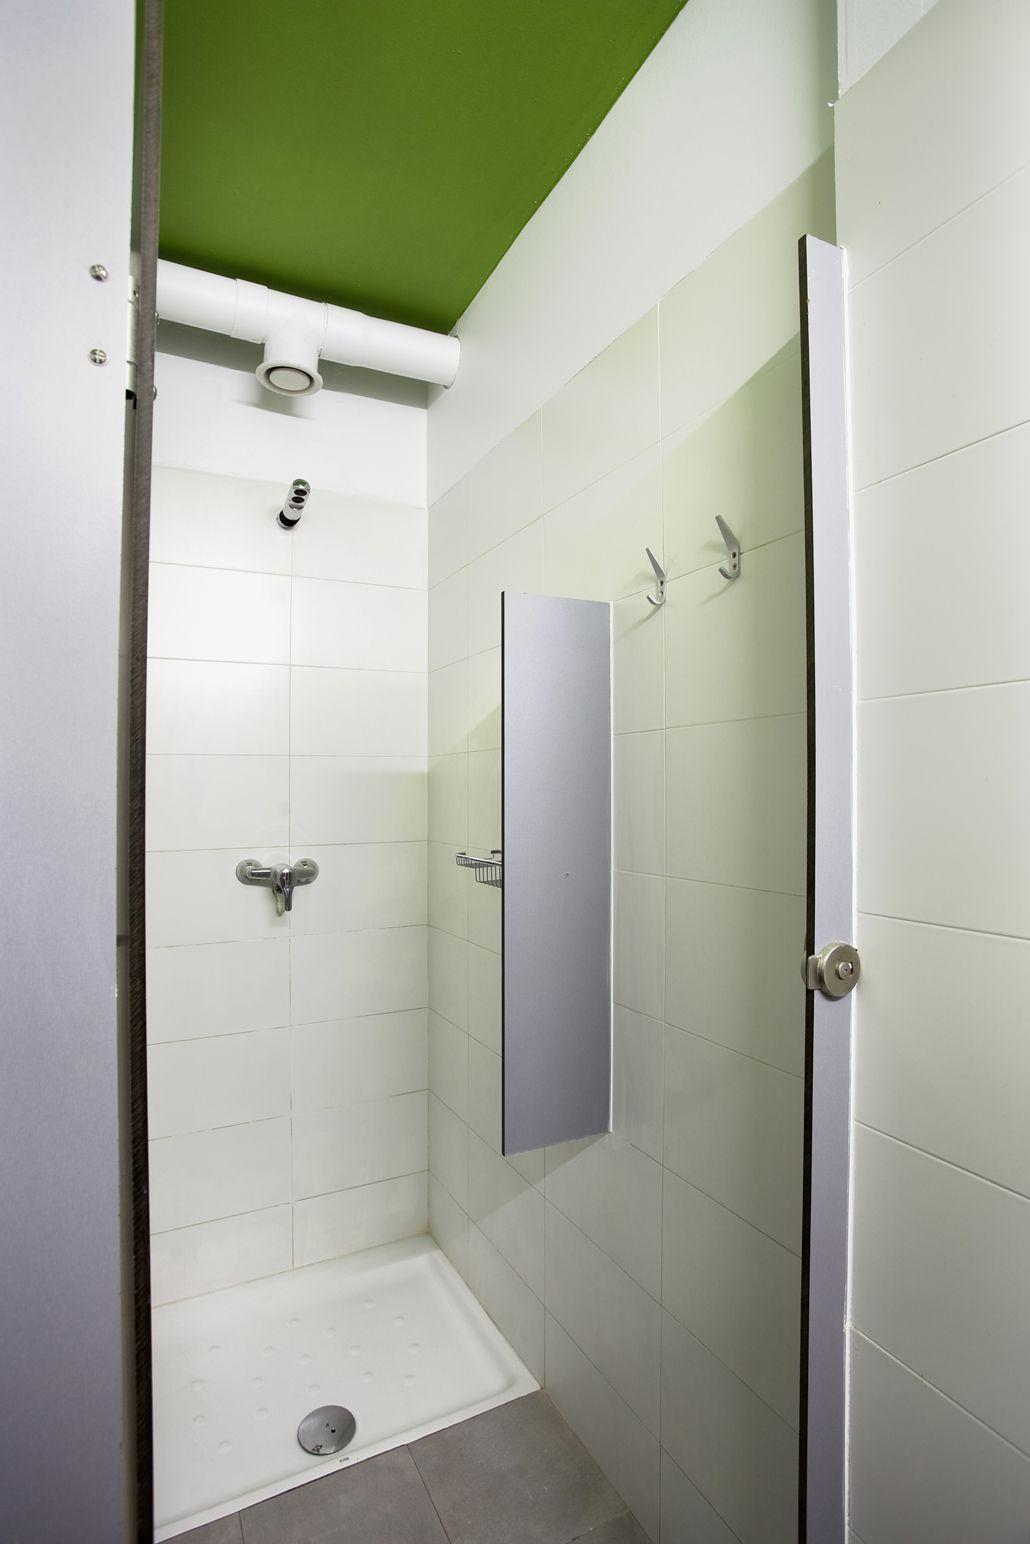 sant jordi hostel alberg barcelona – showers   hostels  pinterest . sant jordi hostel alberg barcelona – showers